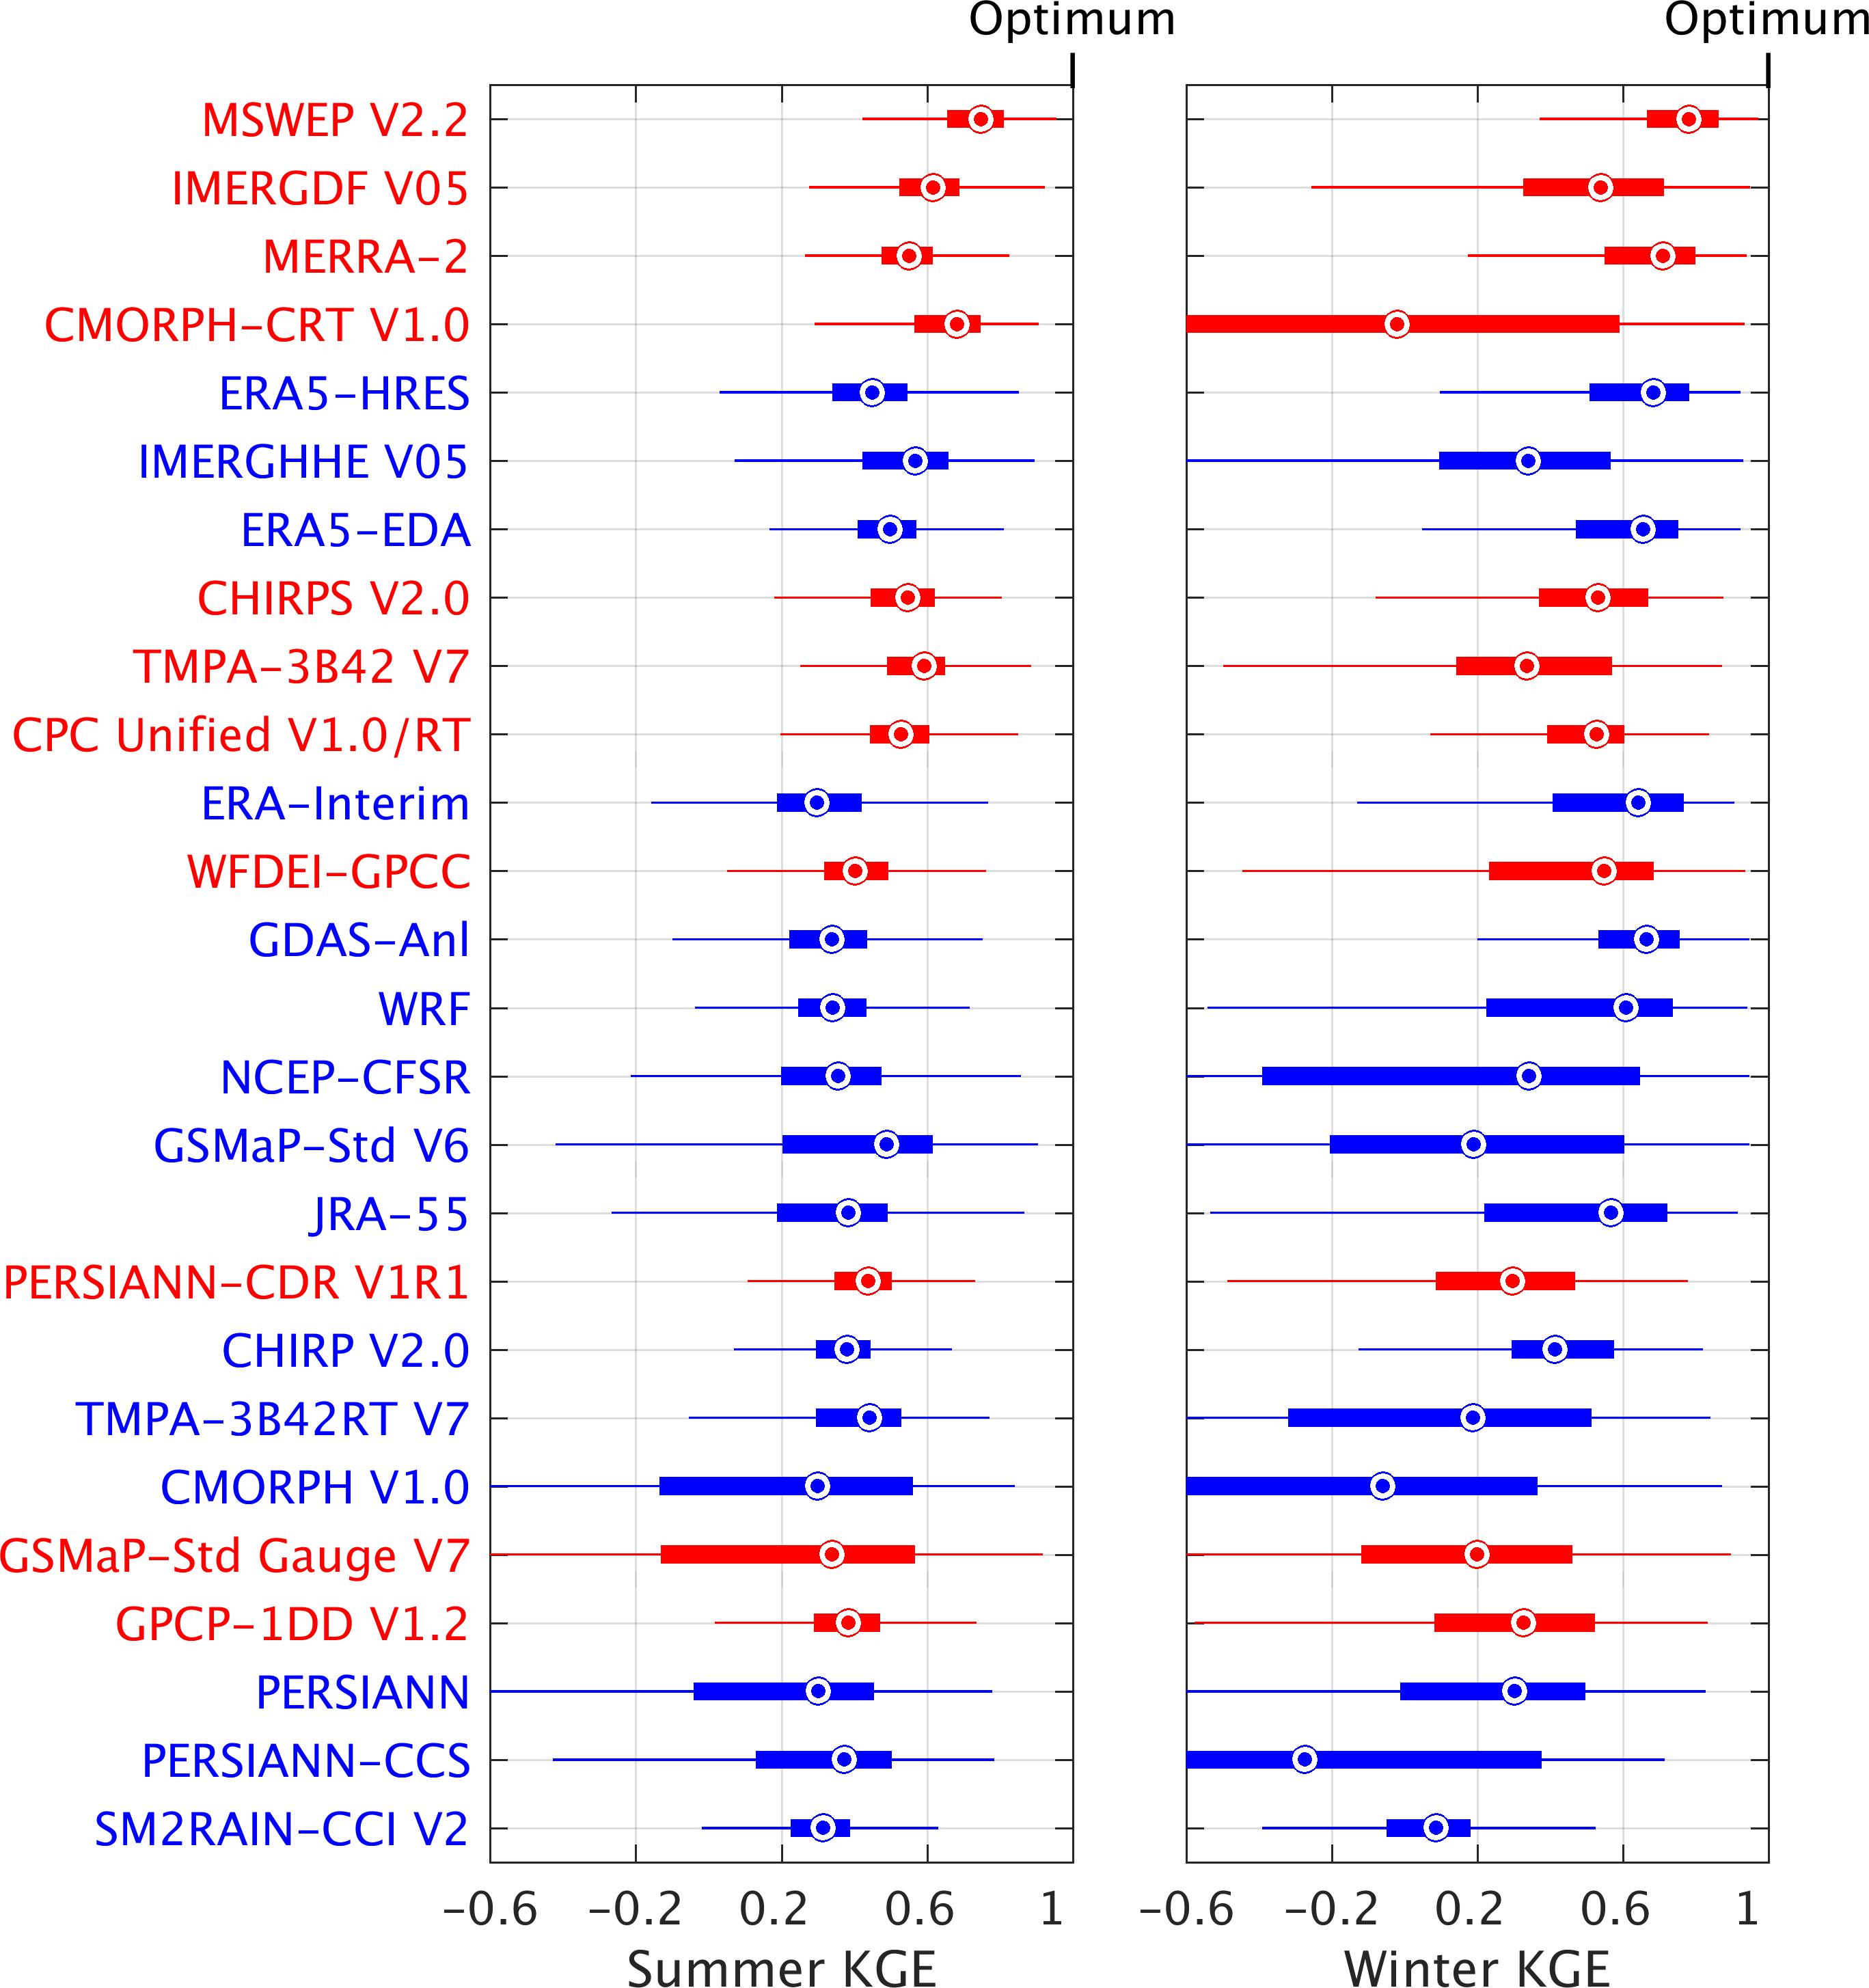 HESS - Daily evaluation of 26 precipitation datasets using